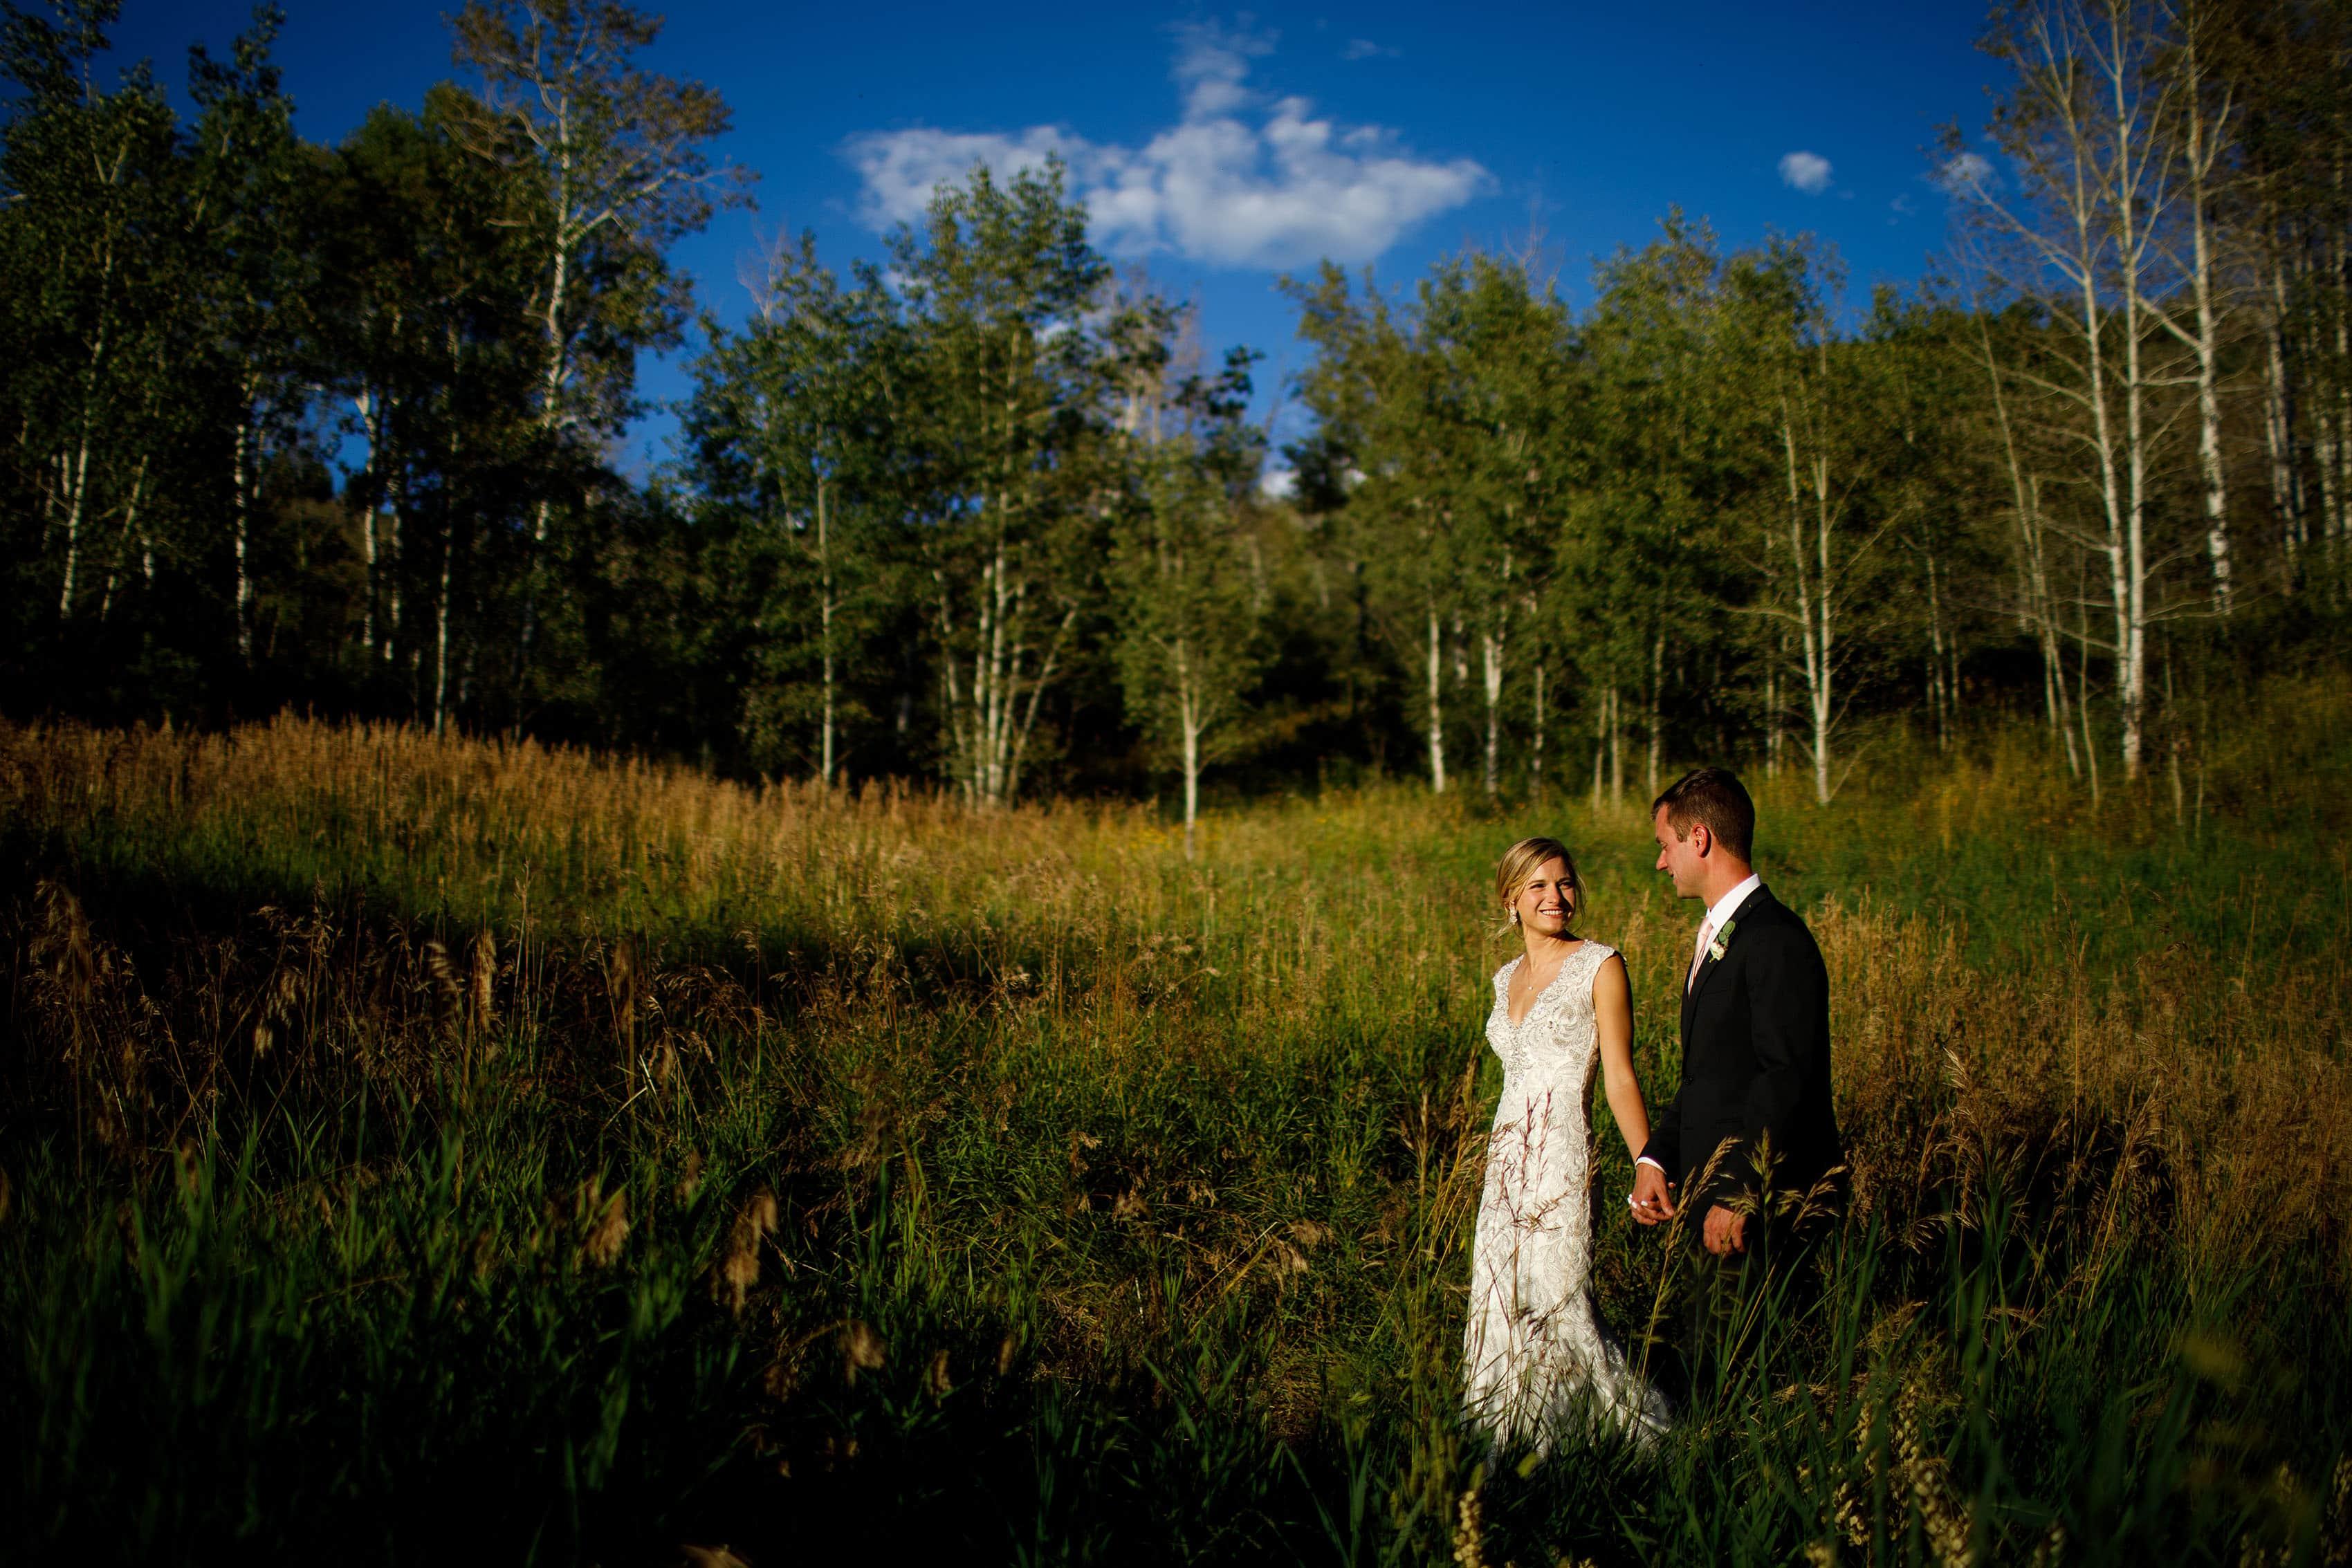 Melissa and Drew walk together in a field behind Saddleridge